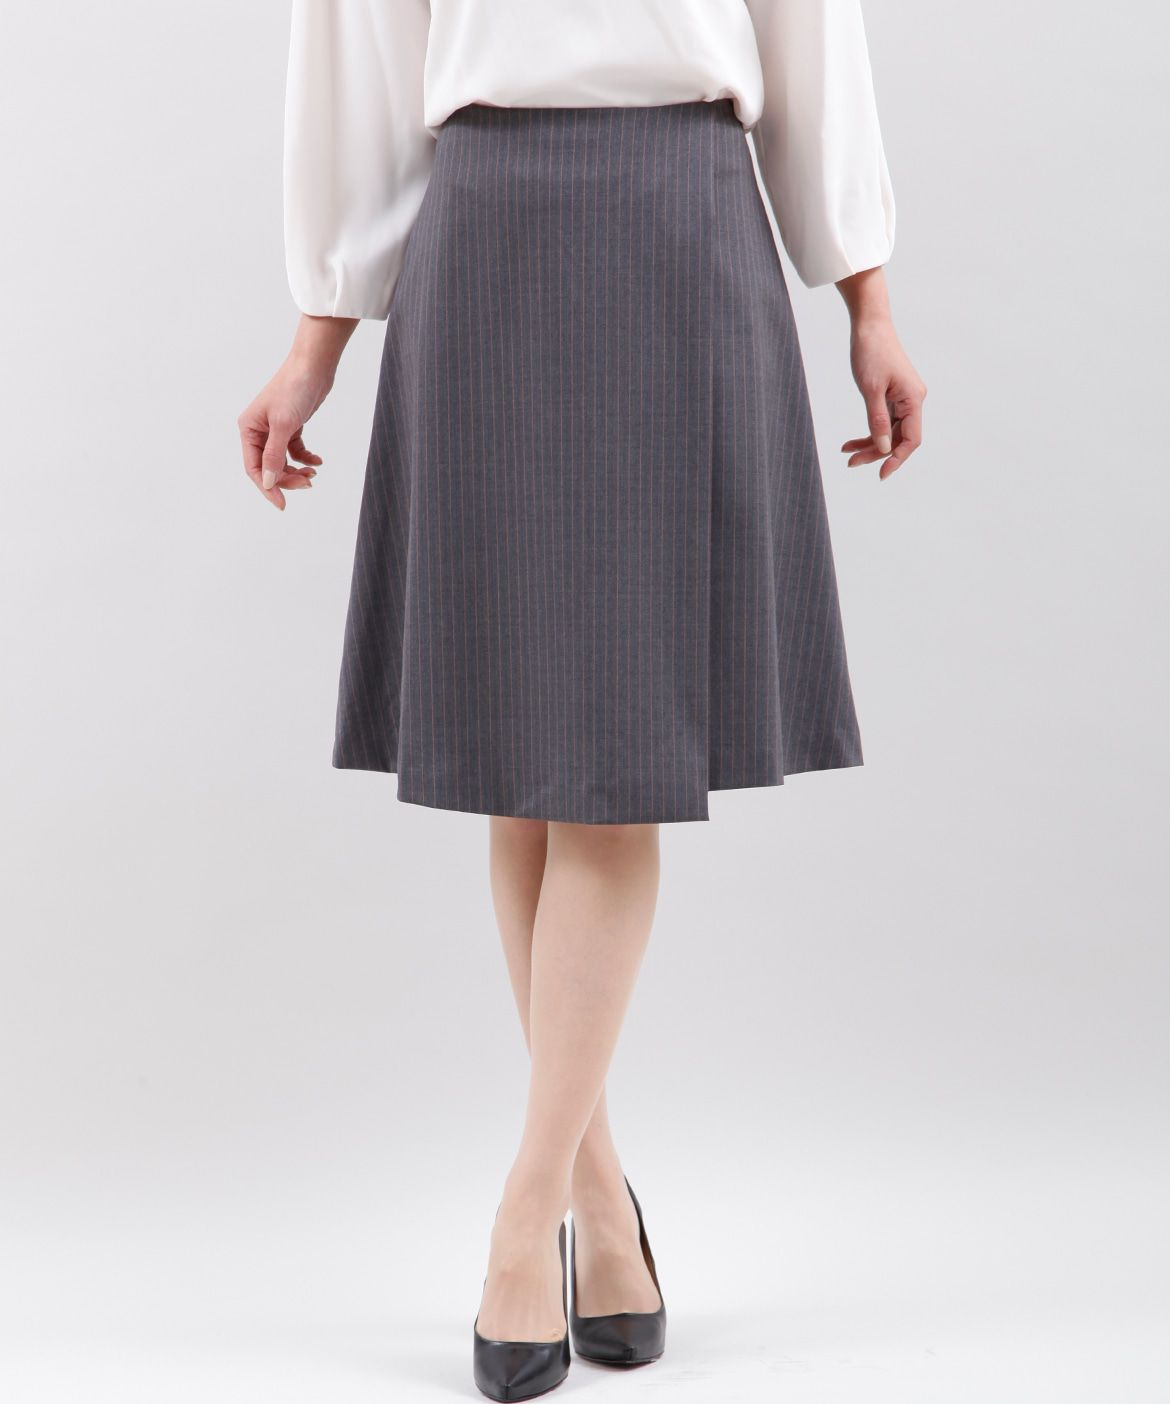 INED(イネド)/ラップ風ピンストライプスカート